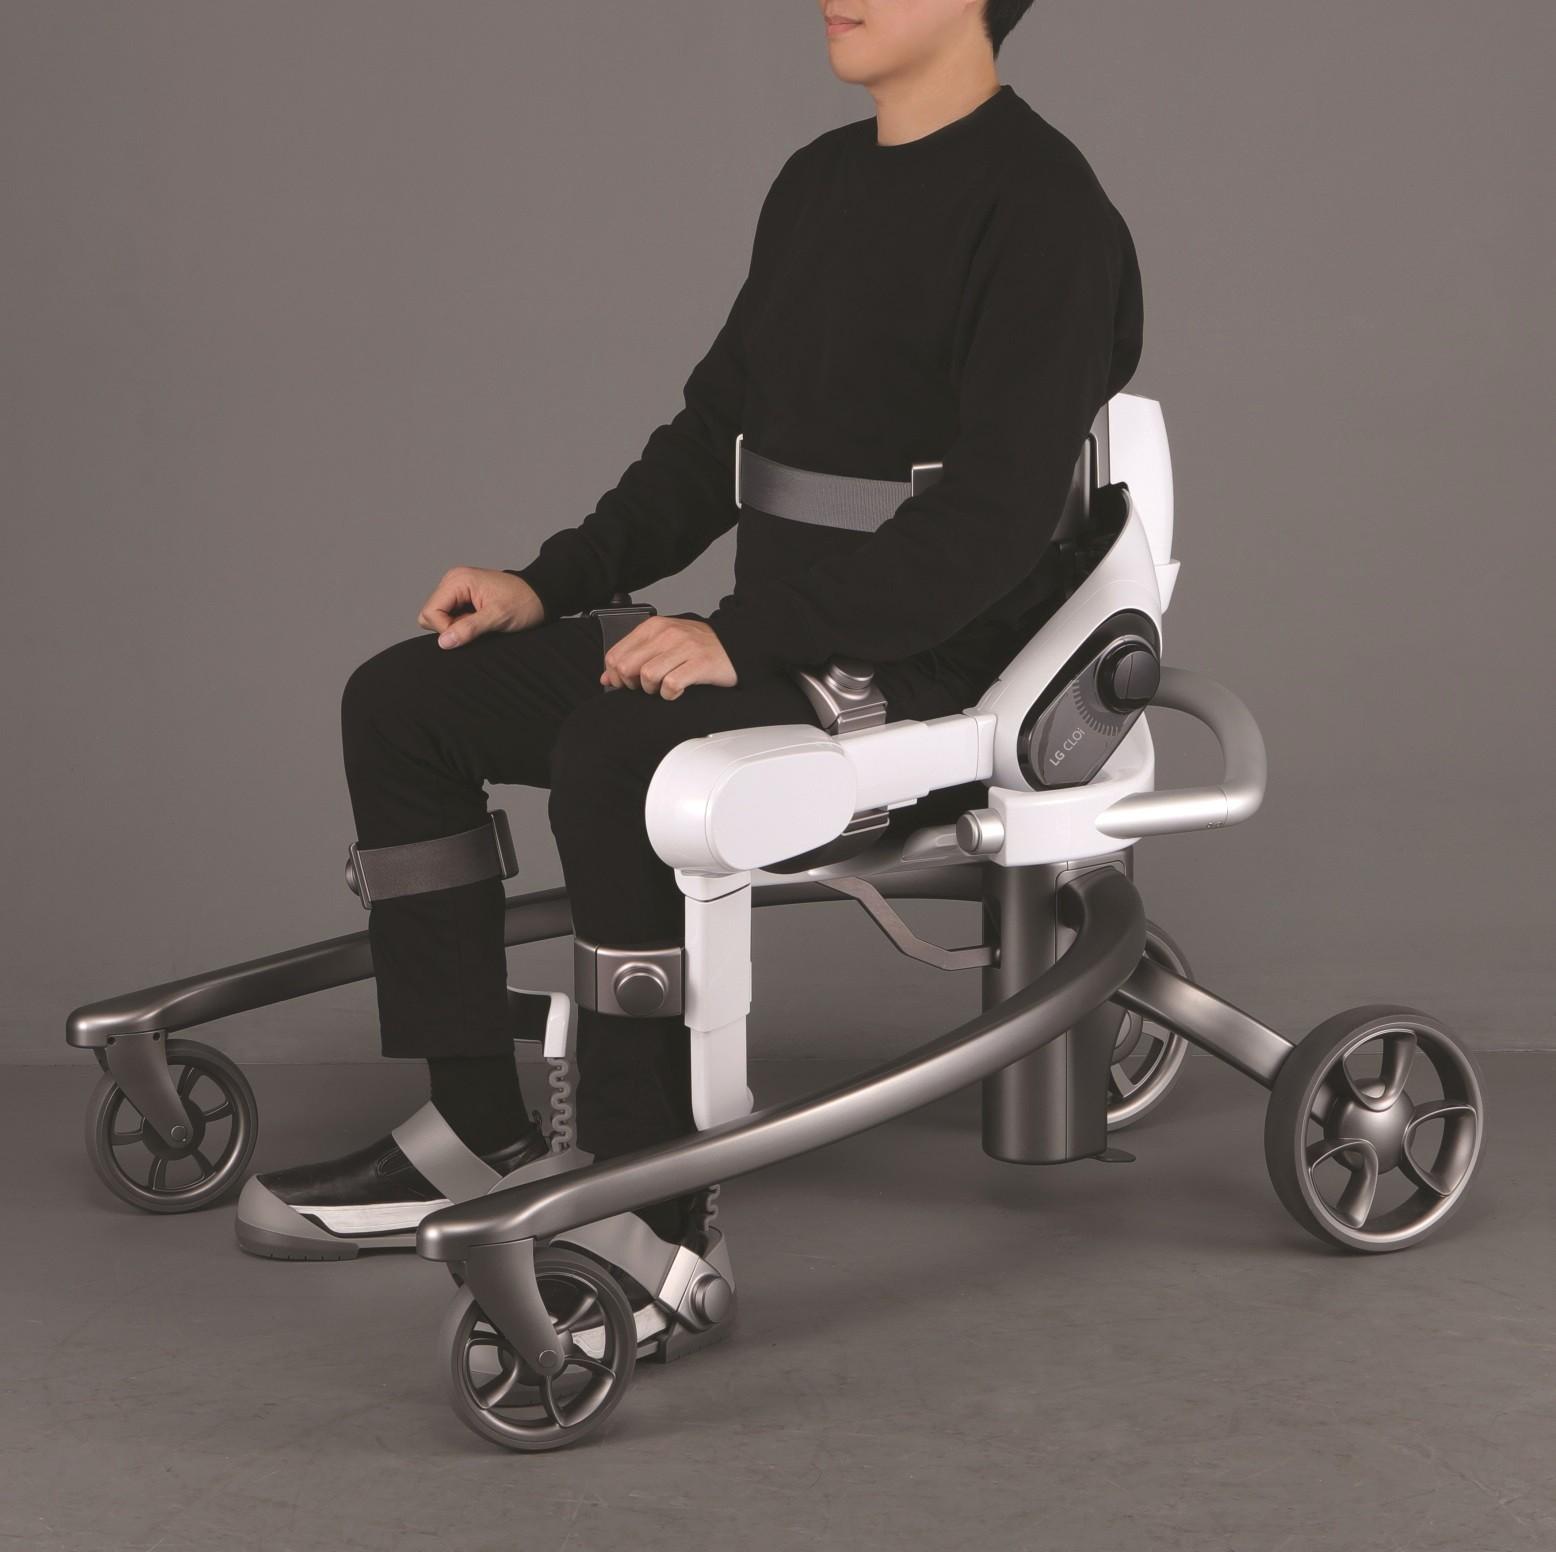 Hyundai_exoskeletons_0001